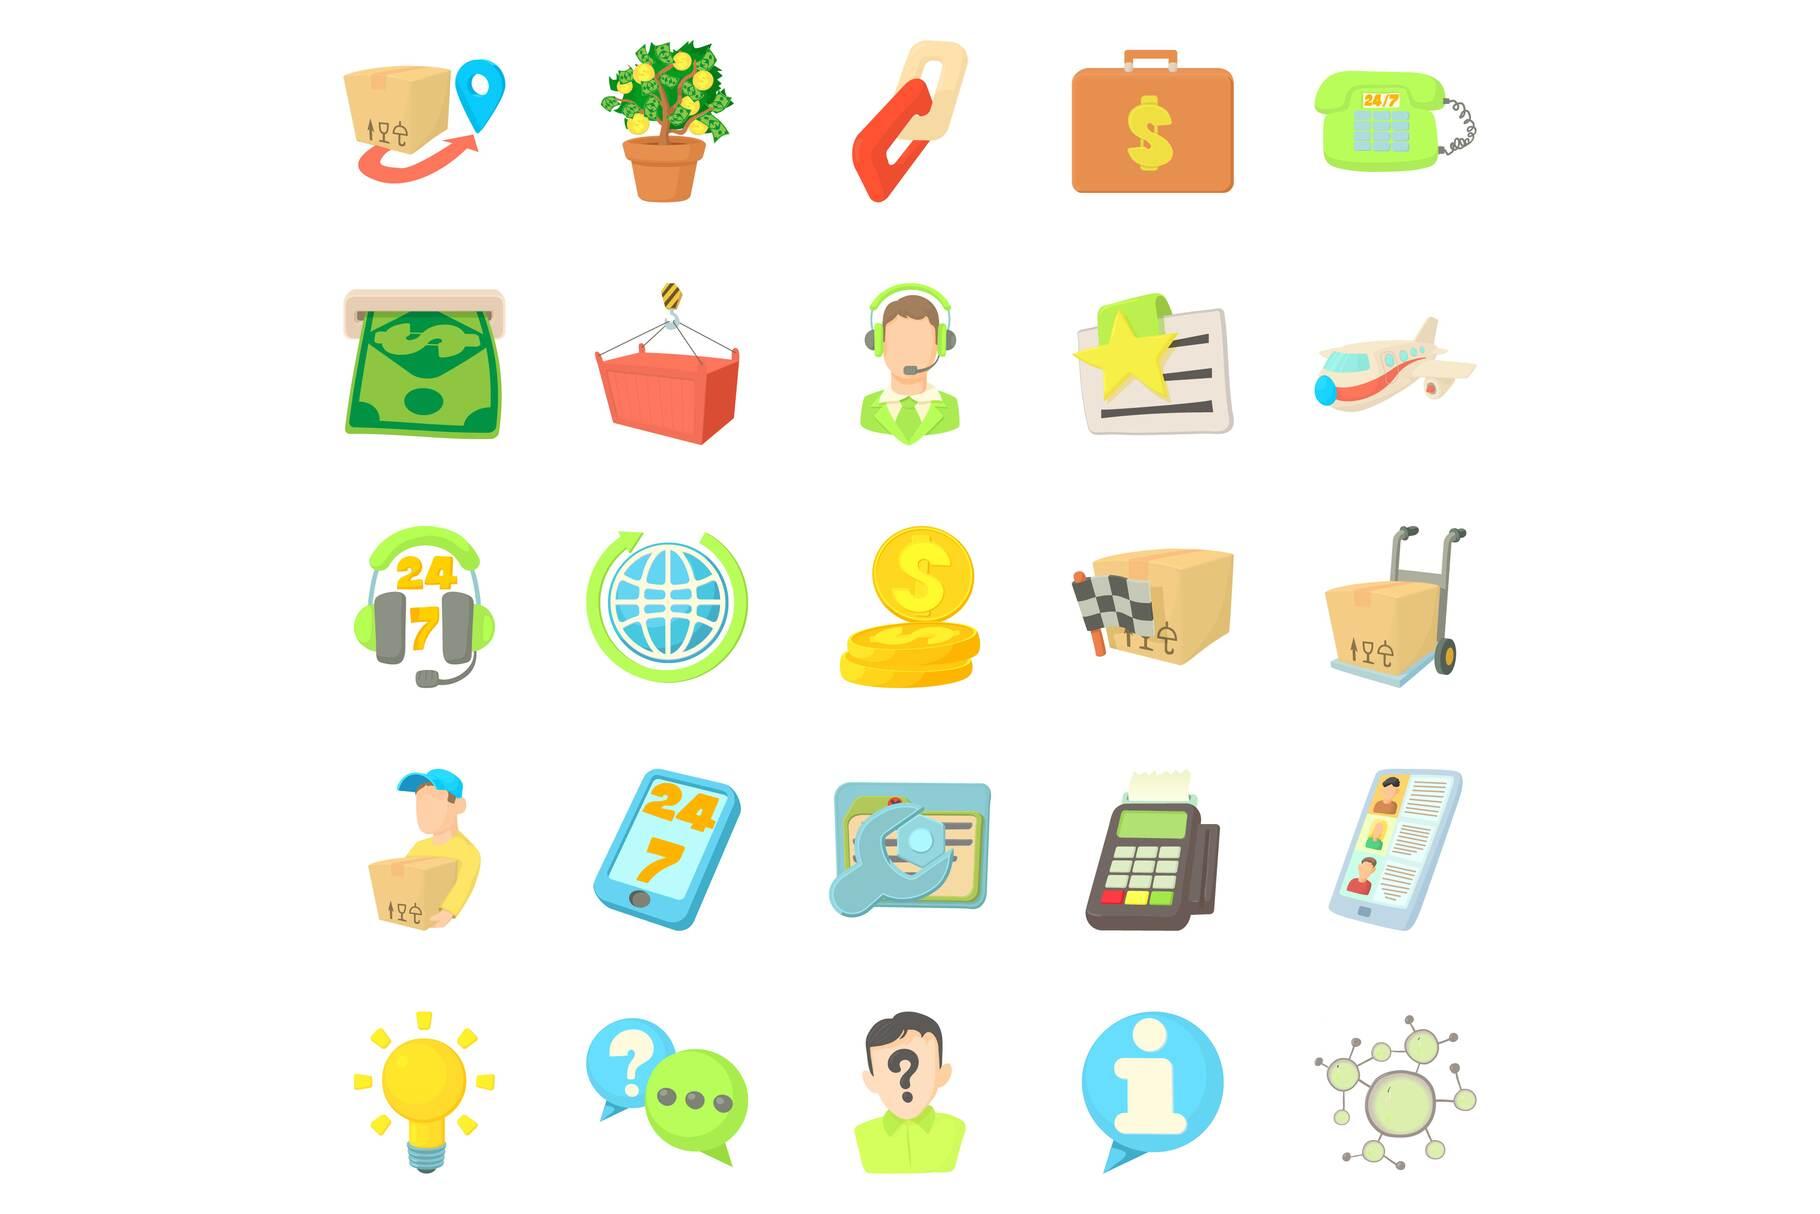 Debit card icons set, cartoon style example image 1